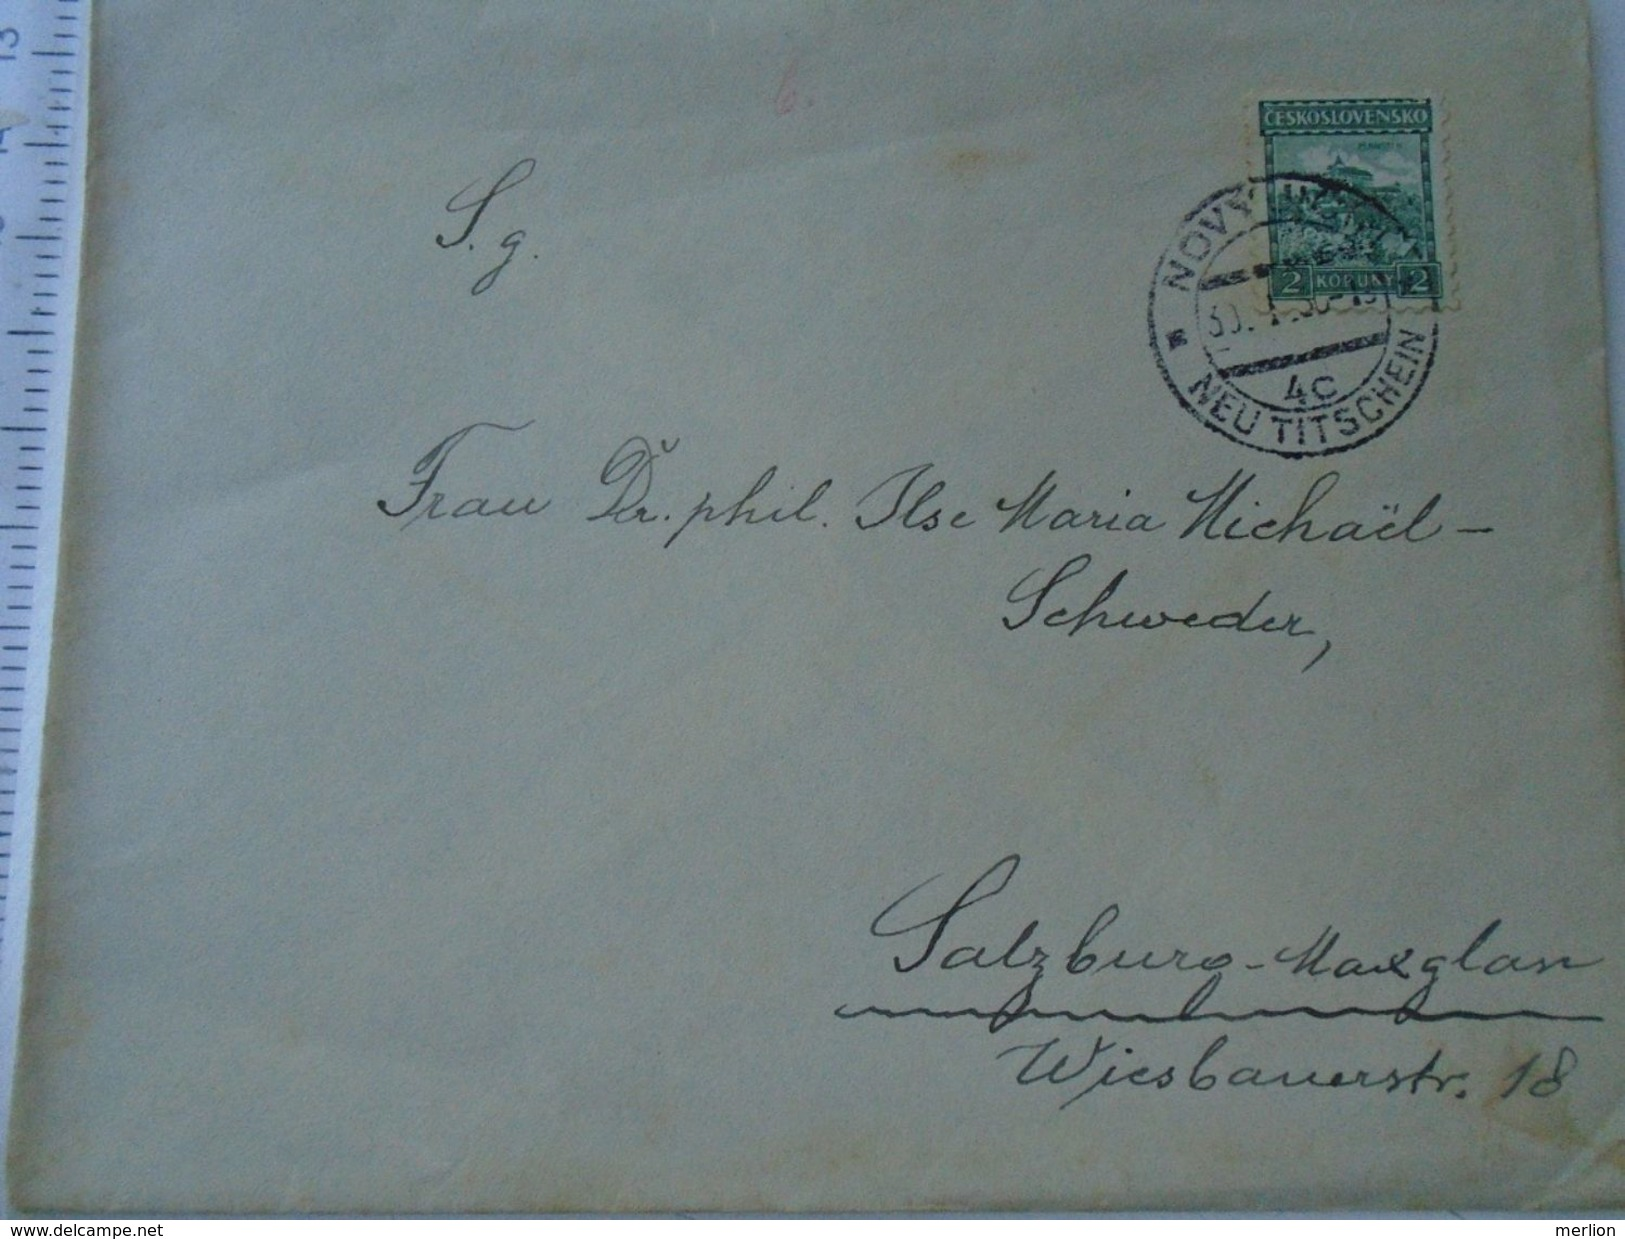 D151508  Ceskoslovakia  Czechoslovakia -Cover -  1930's  Novy Jicin - Neu-Titschein  -sent To Salzburg -Maxglan - Tschechoslowakei/CSSR